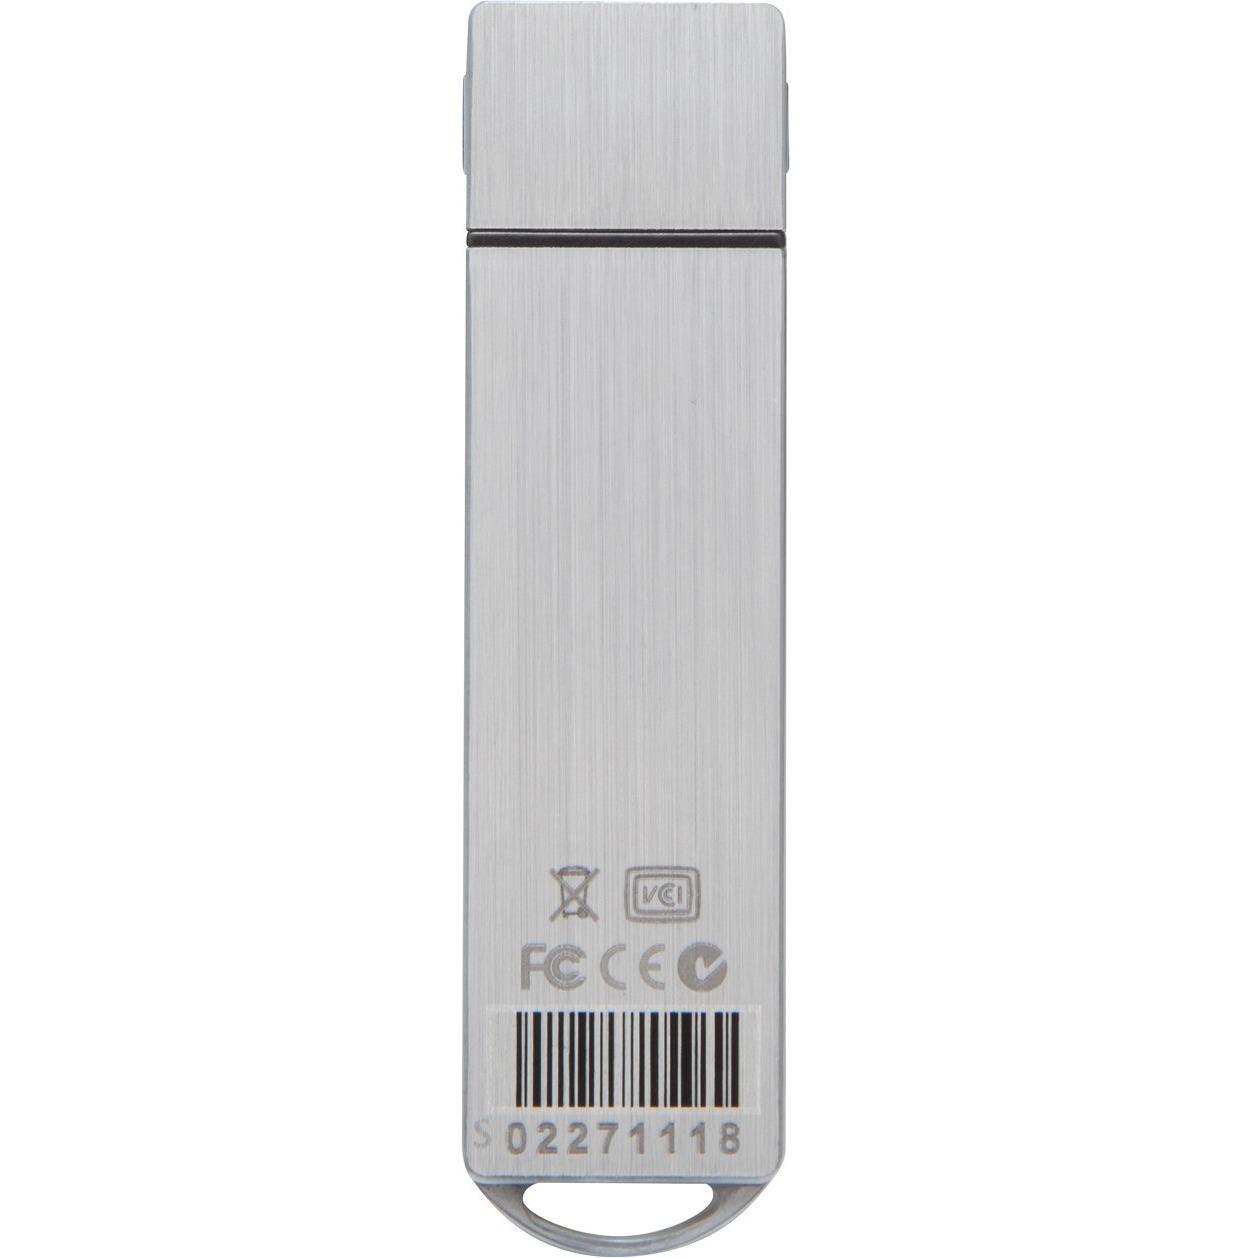 IronKey Basic S1000 8 GB USB 3.0 Flash Drive - 256-bit AES